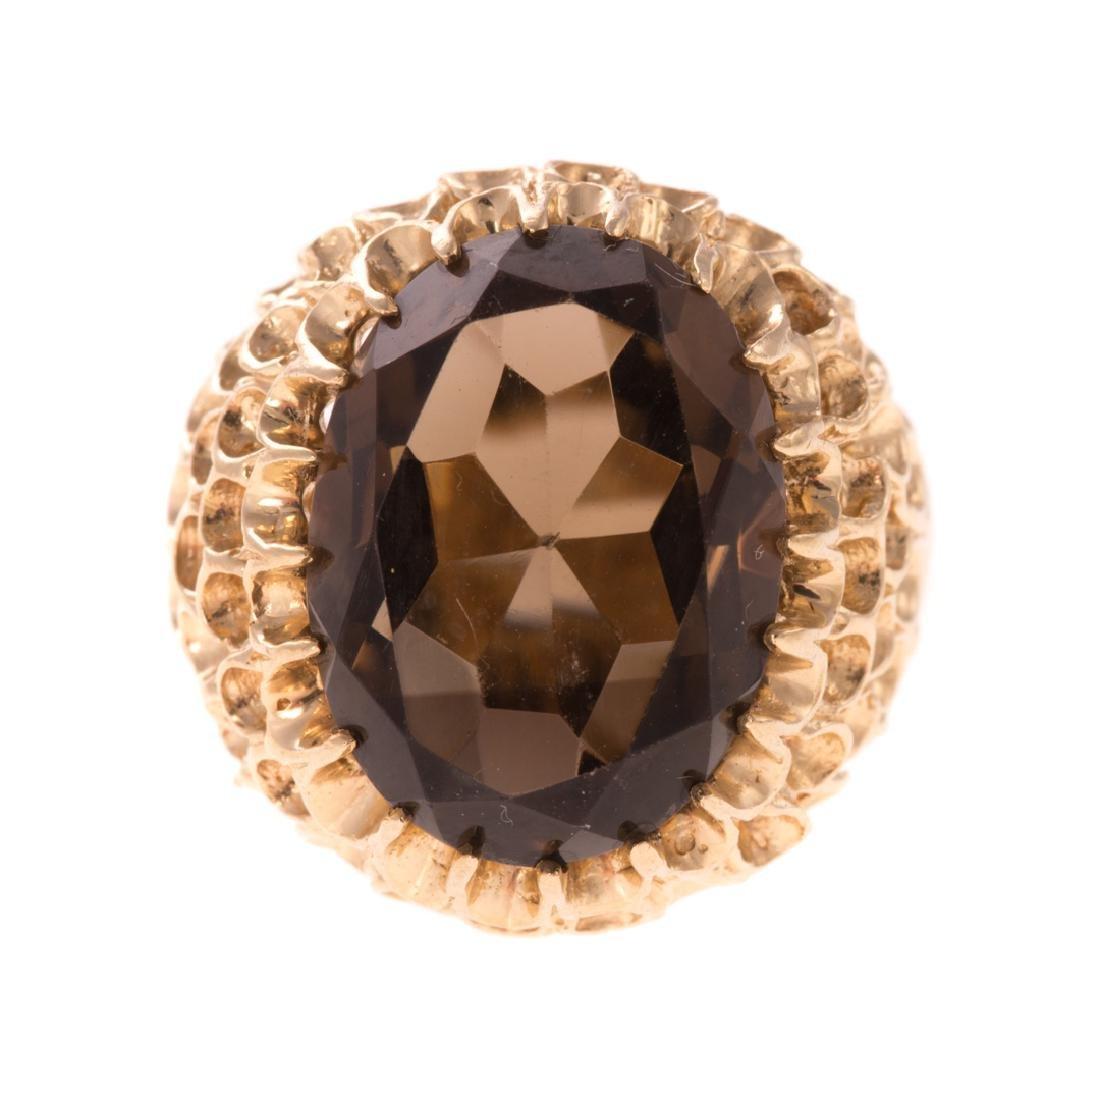 A Lady's 14K Oval Smokey Quartz Ring